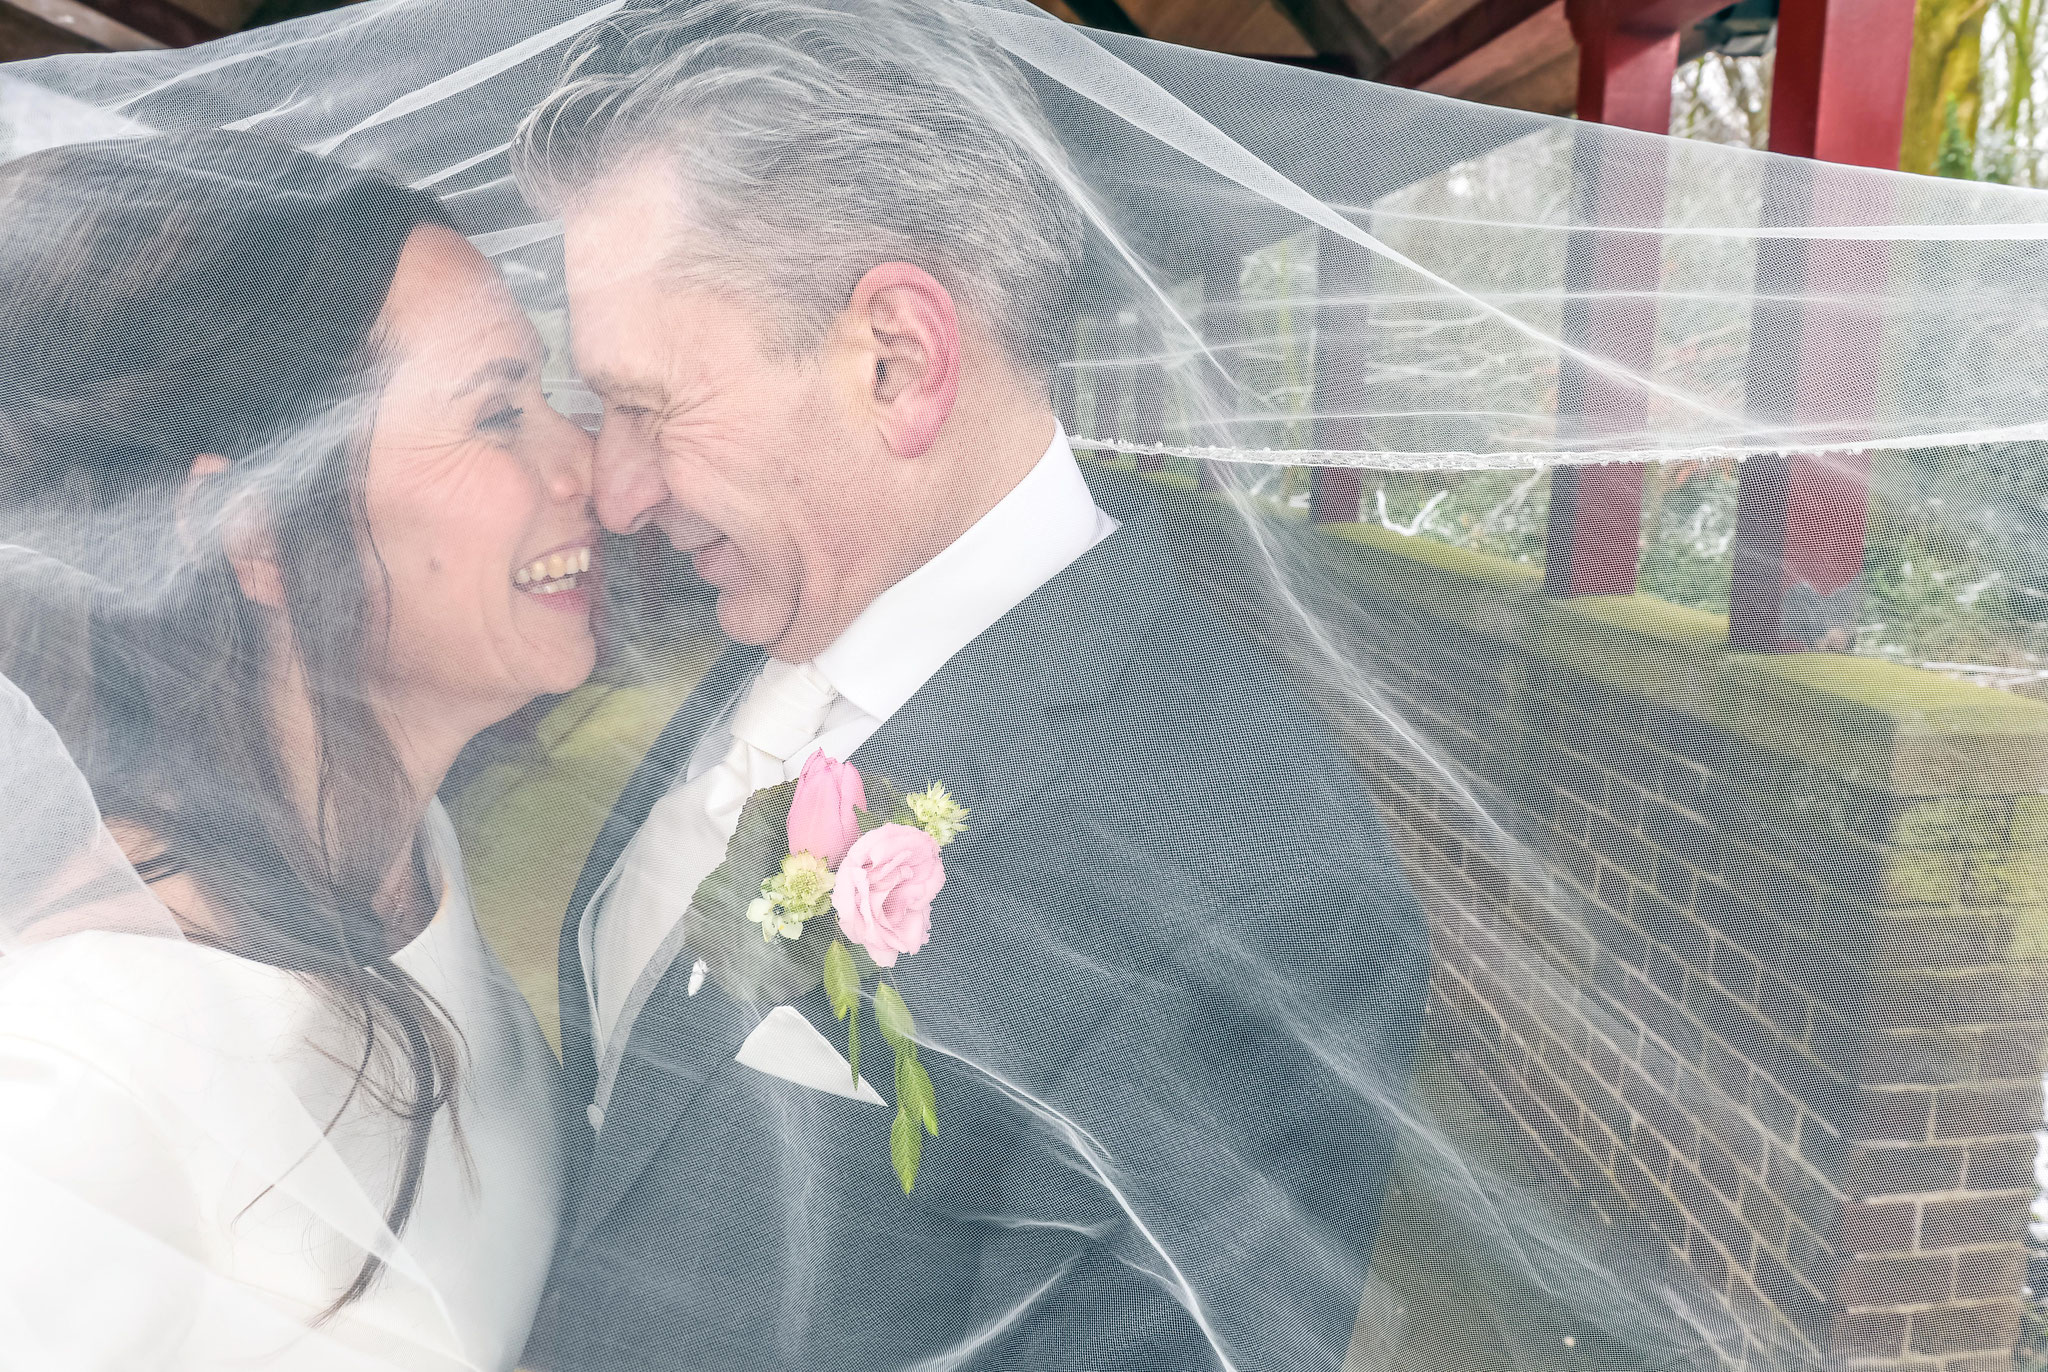 Bruidssluier en de liefde